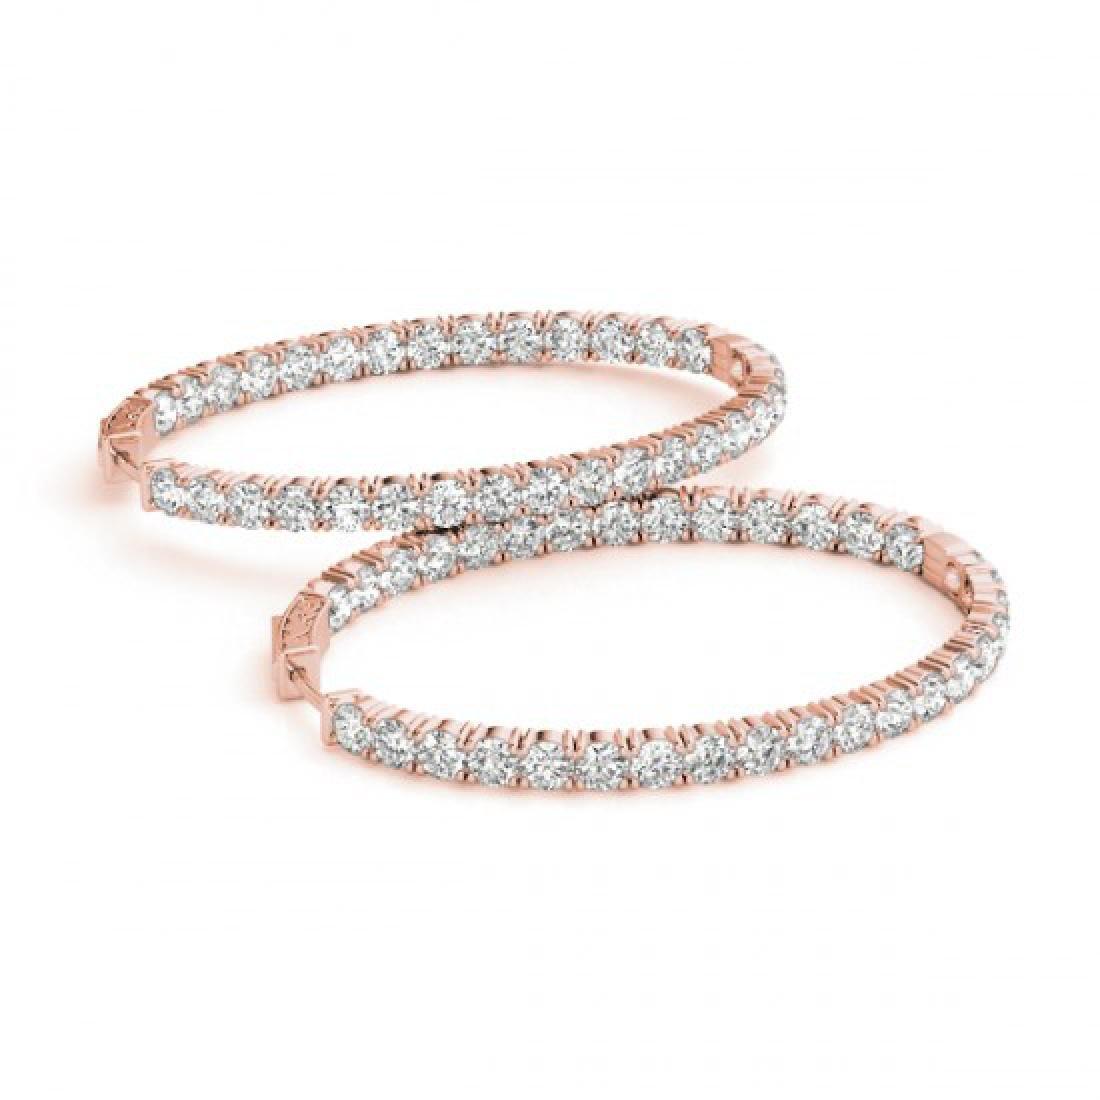 7 CTW Diamond VS/SI Certified 20 Mm Hoop Earrings 14K